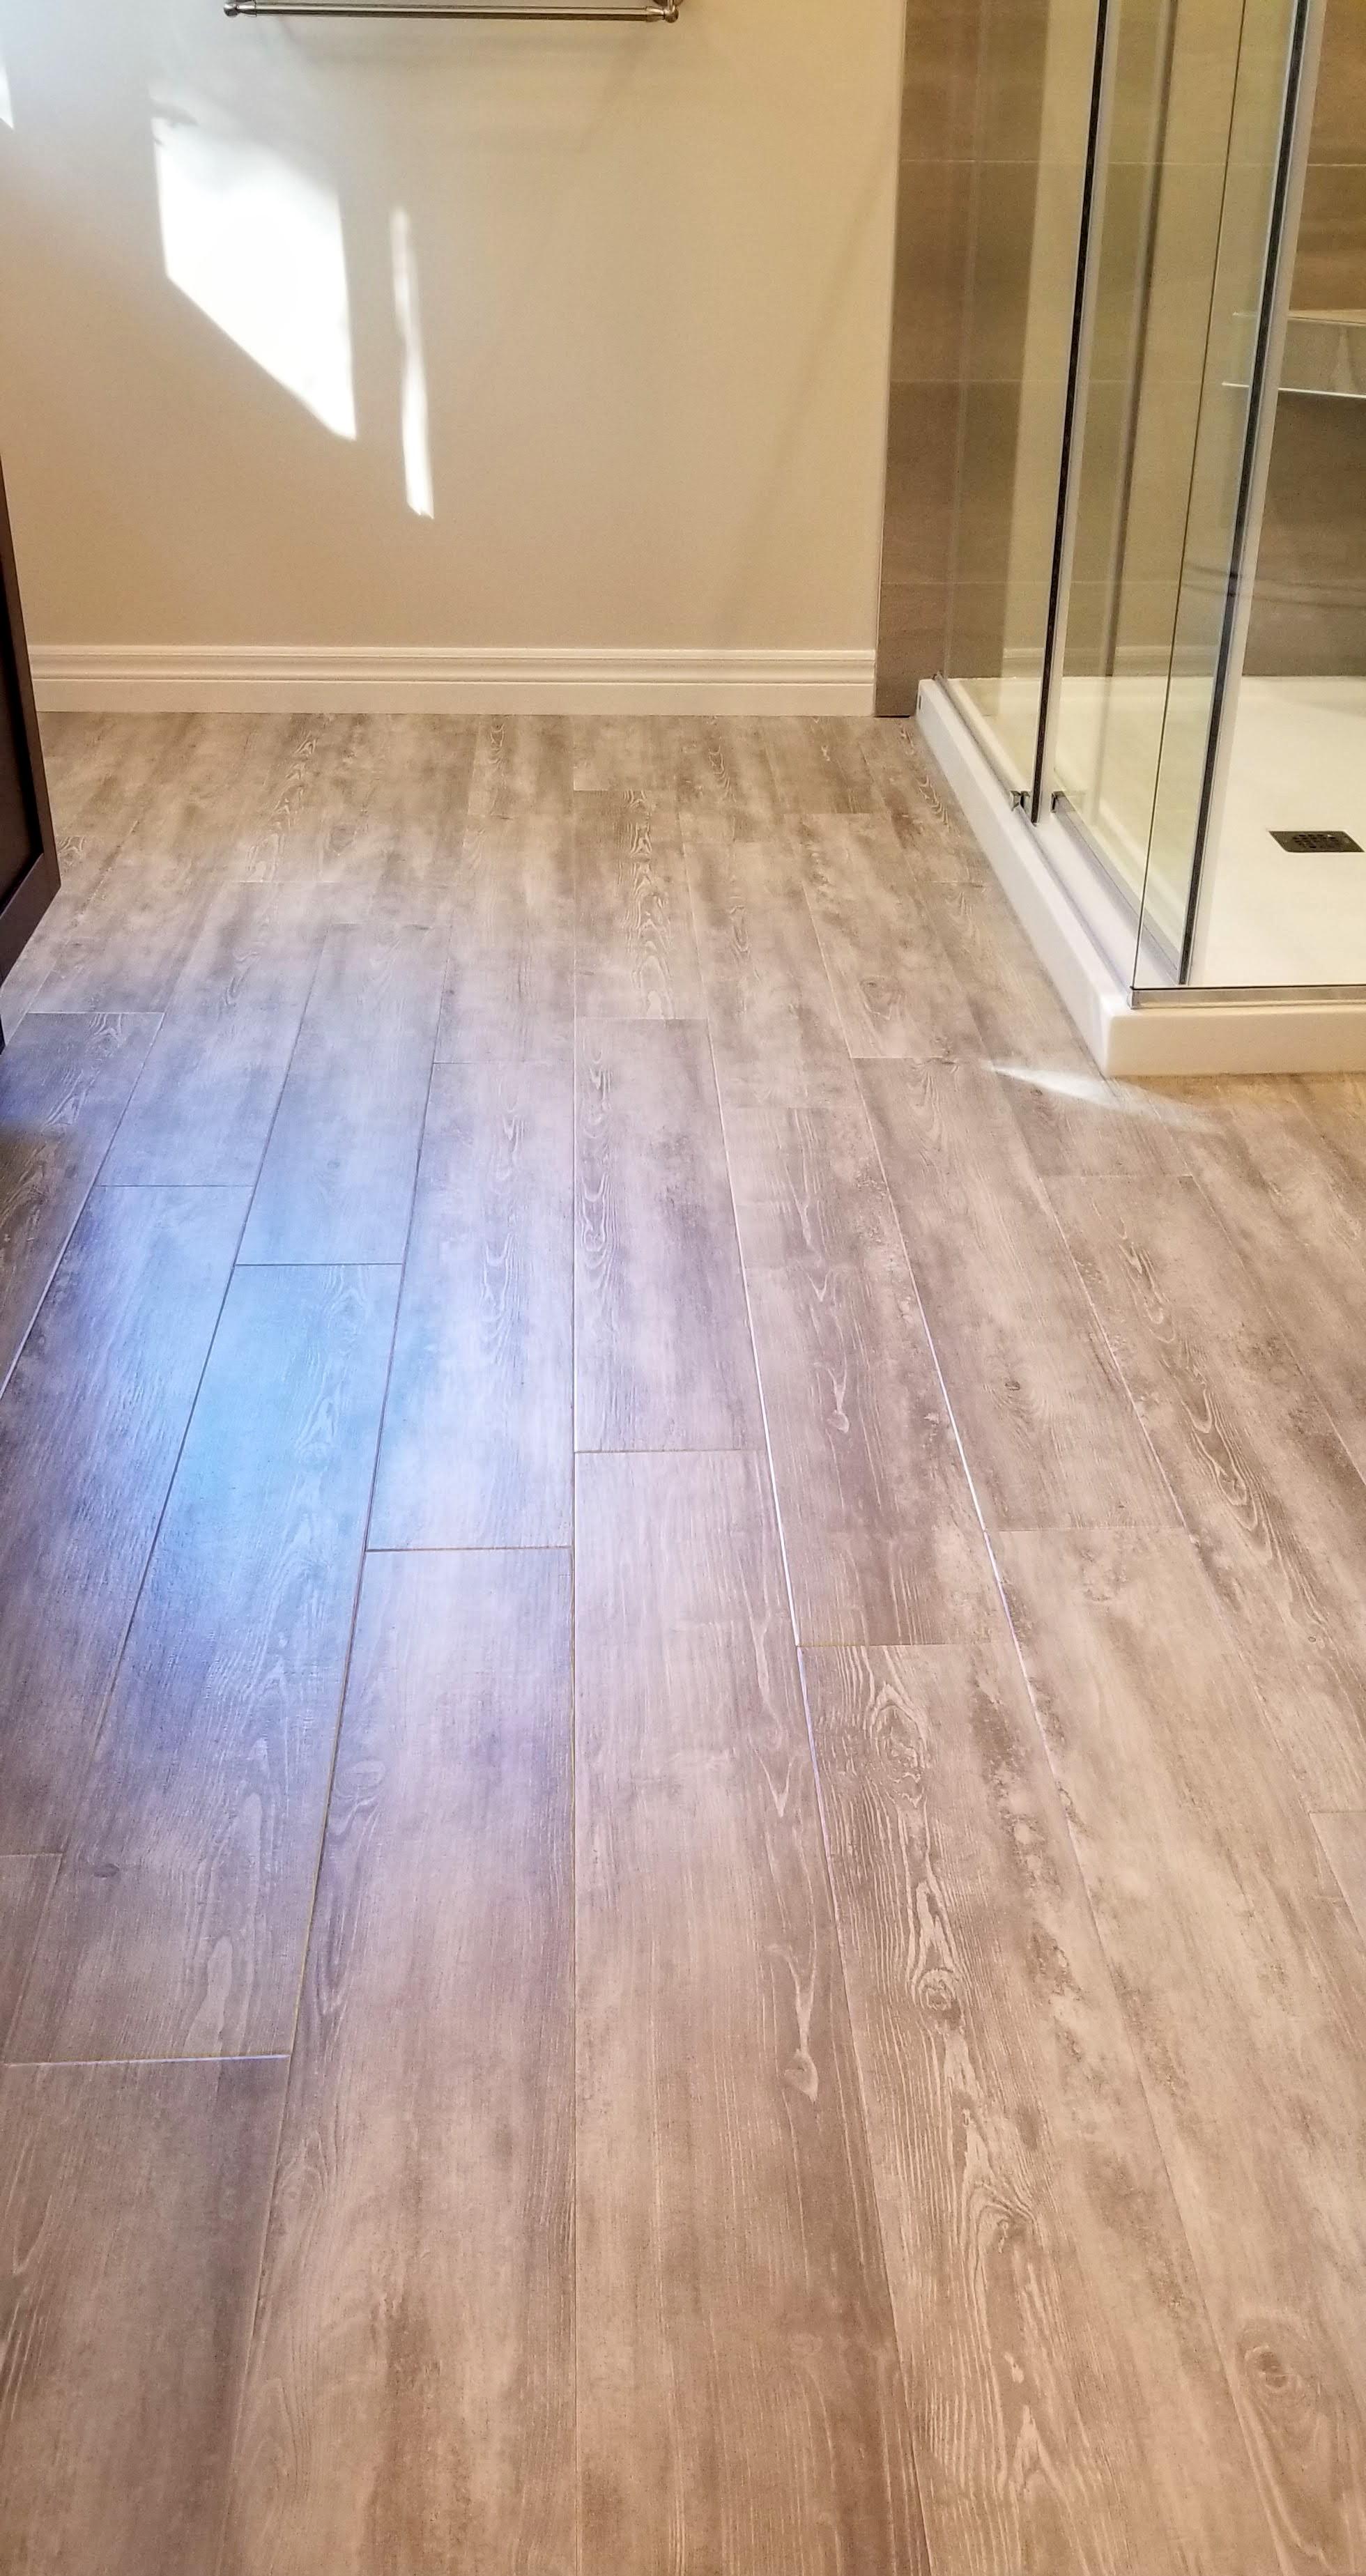 Vinyl plank floor installed in ensuite bathroom floor by Germano Creative Interior Contracting Ltd.